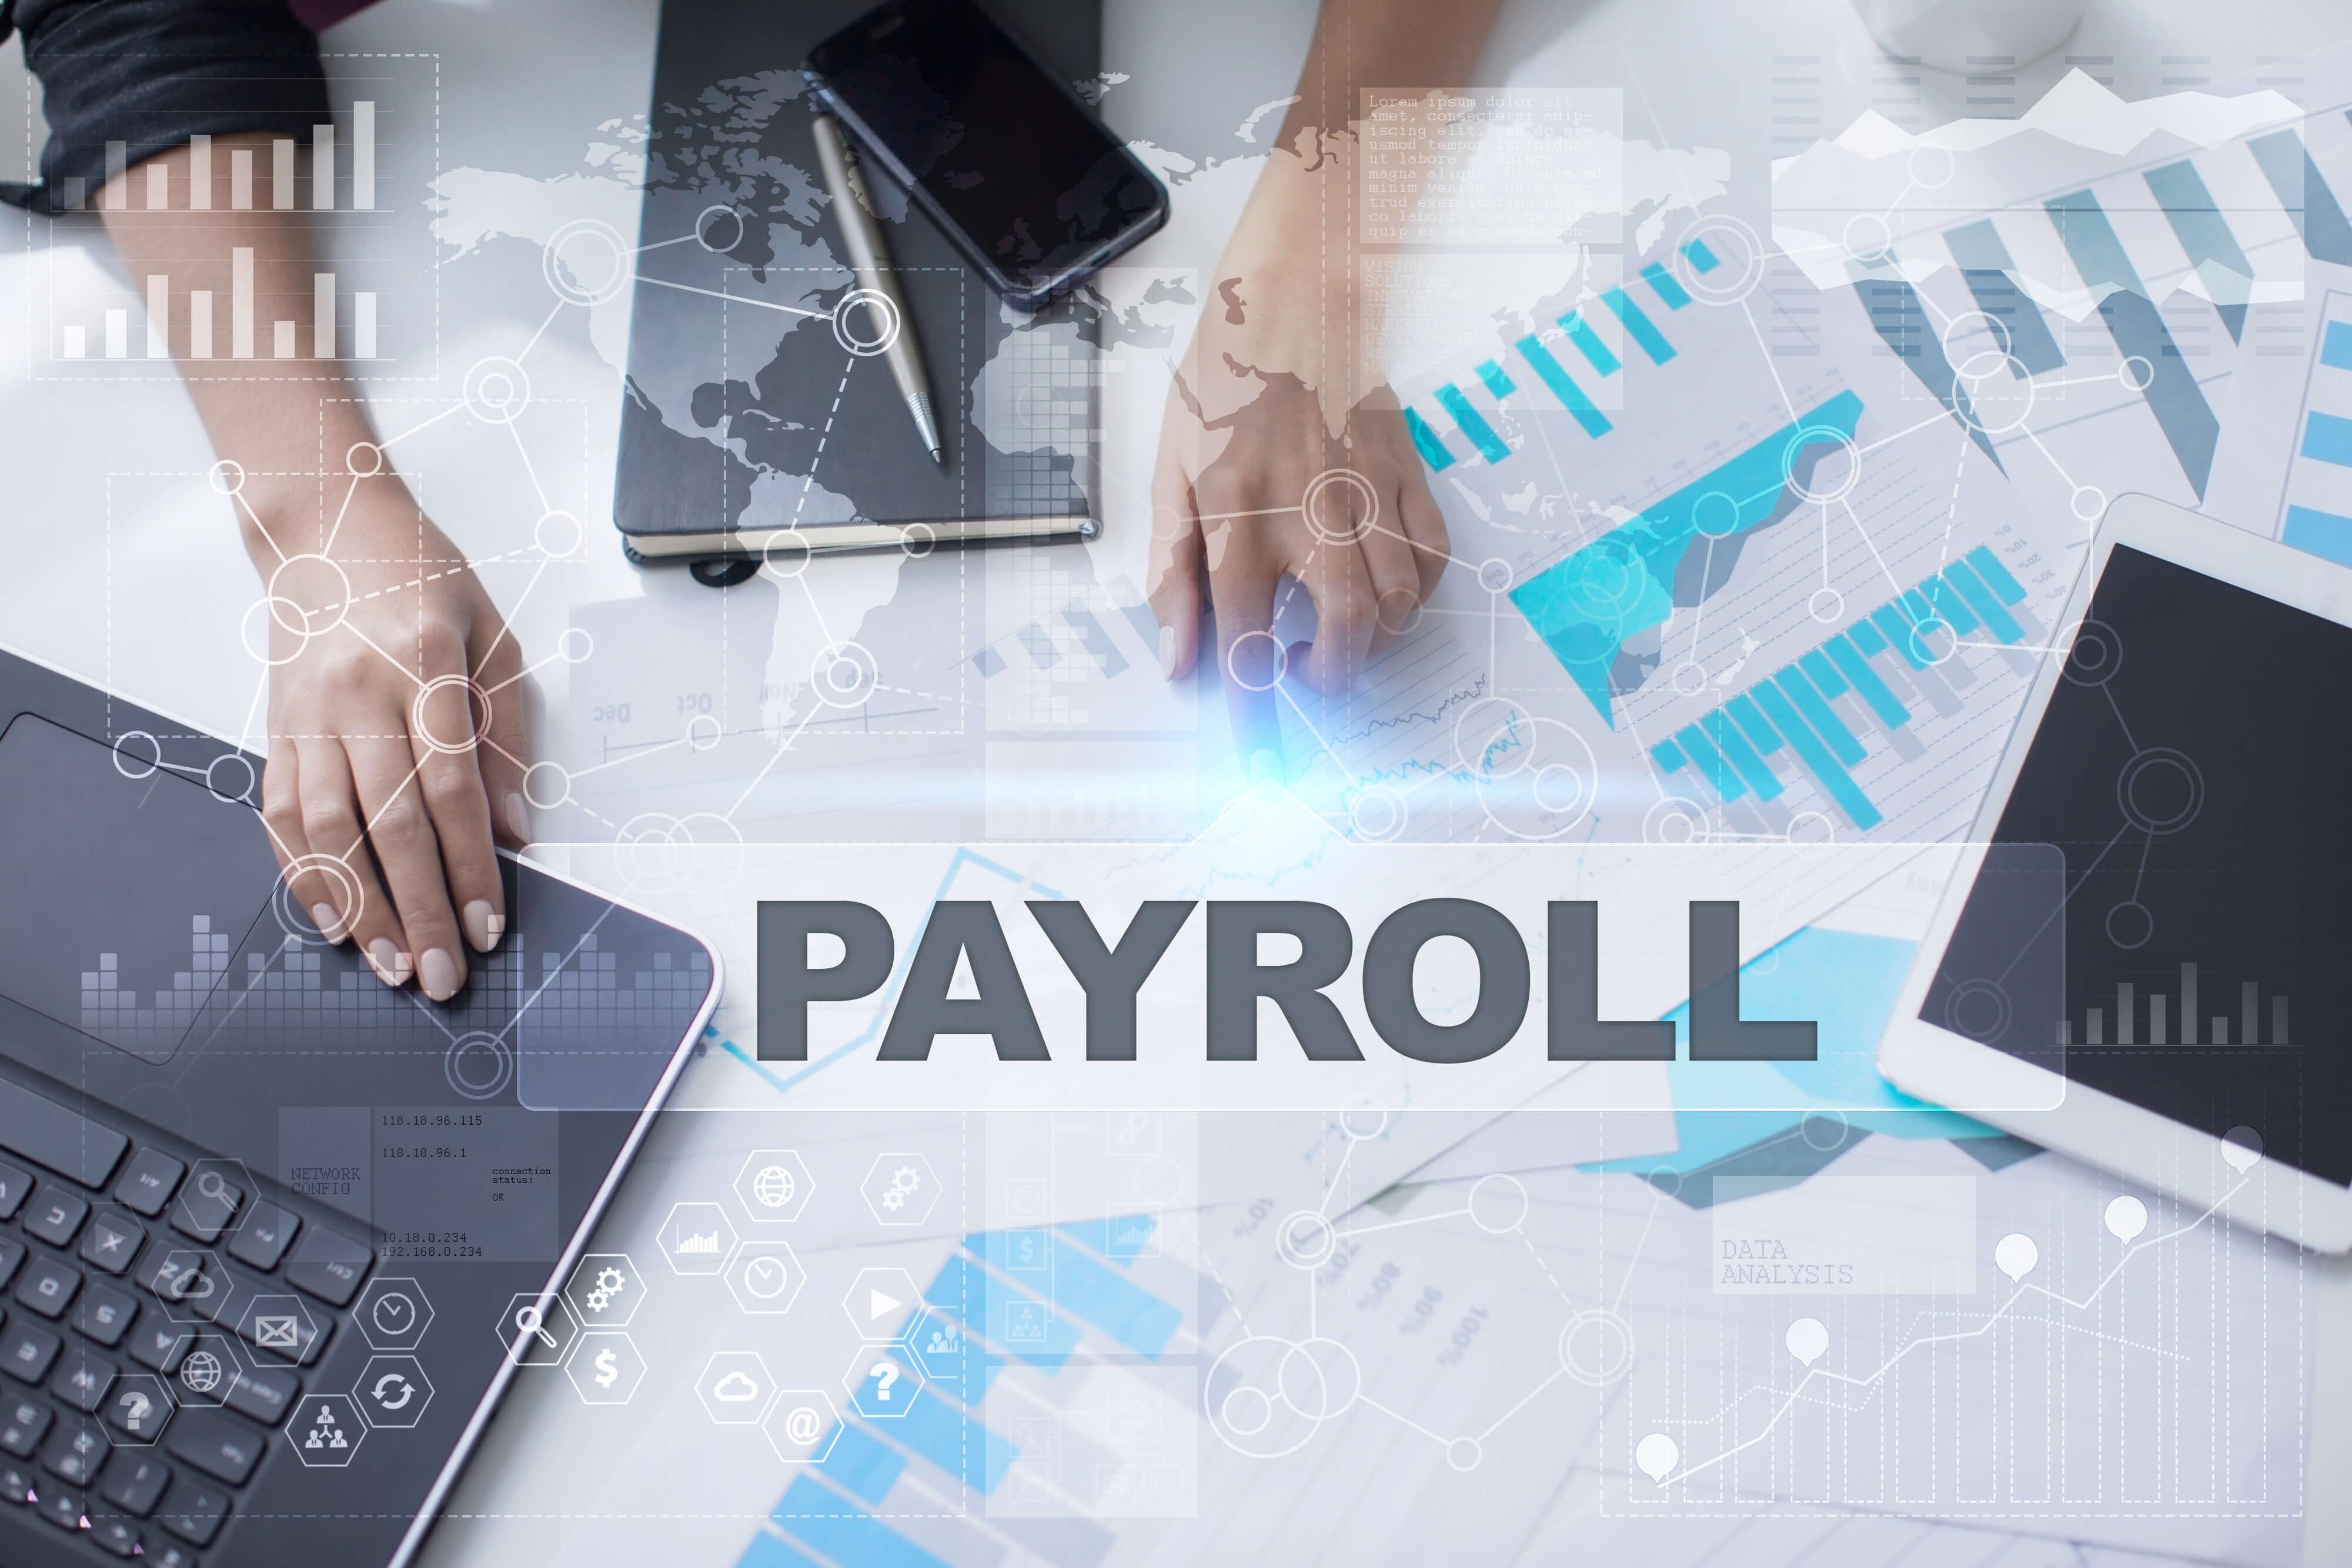 4 Hidden Risks Of The Payroll System Payroll Risk Management